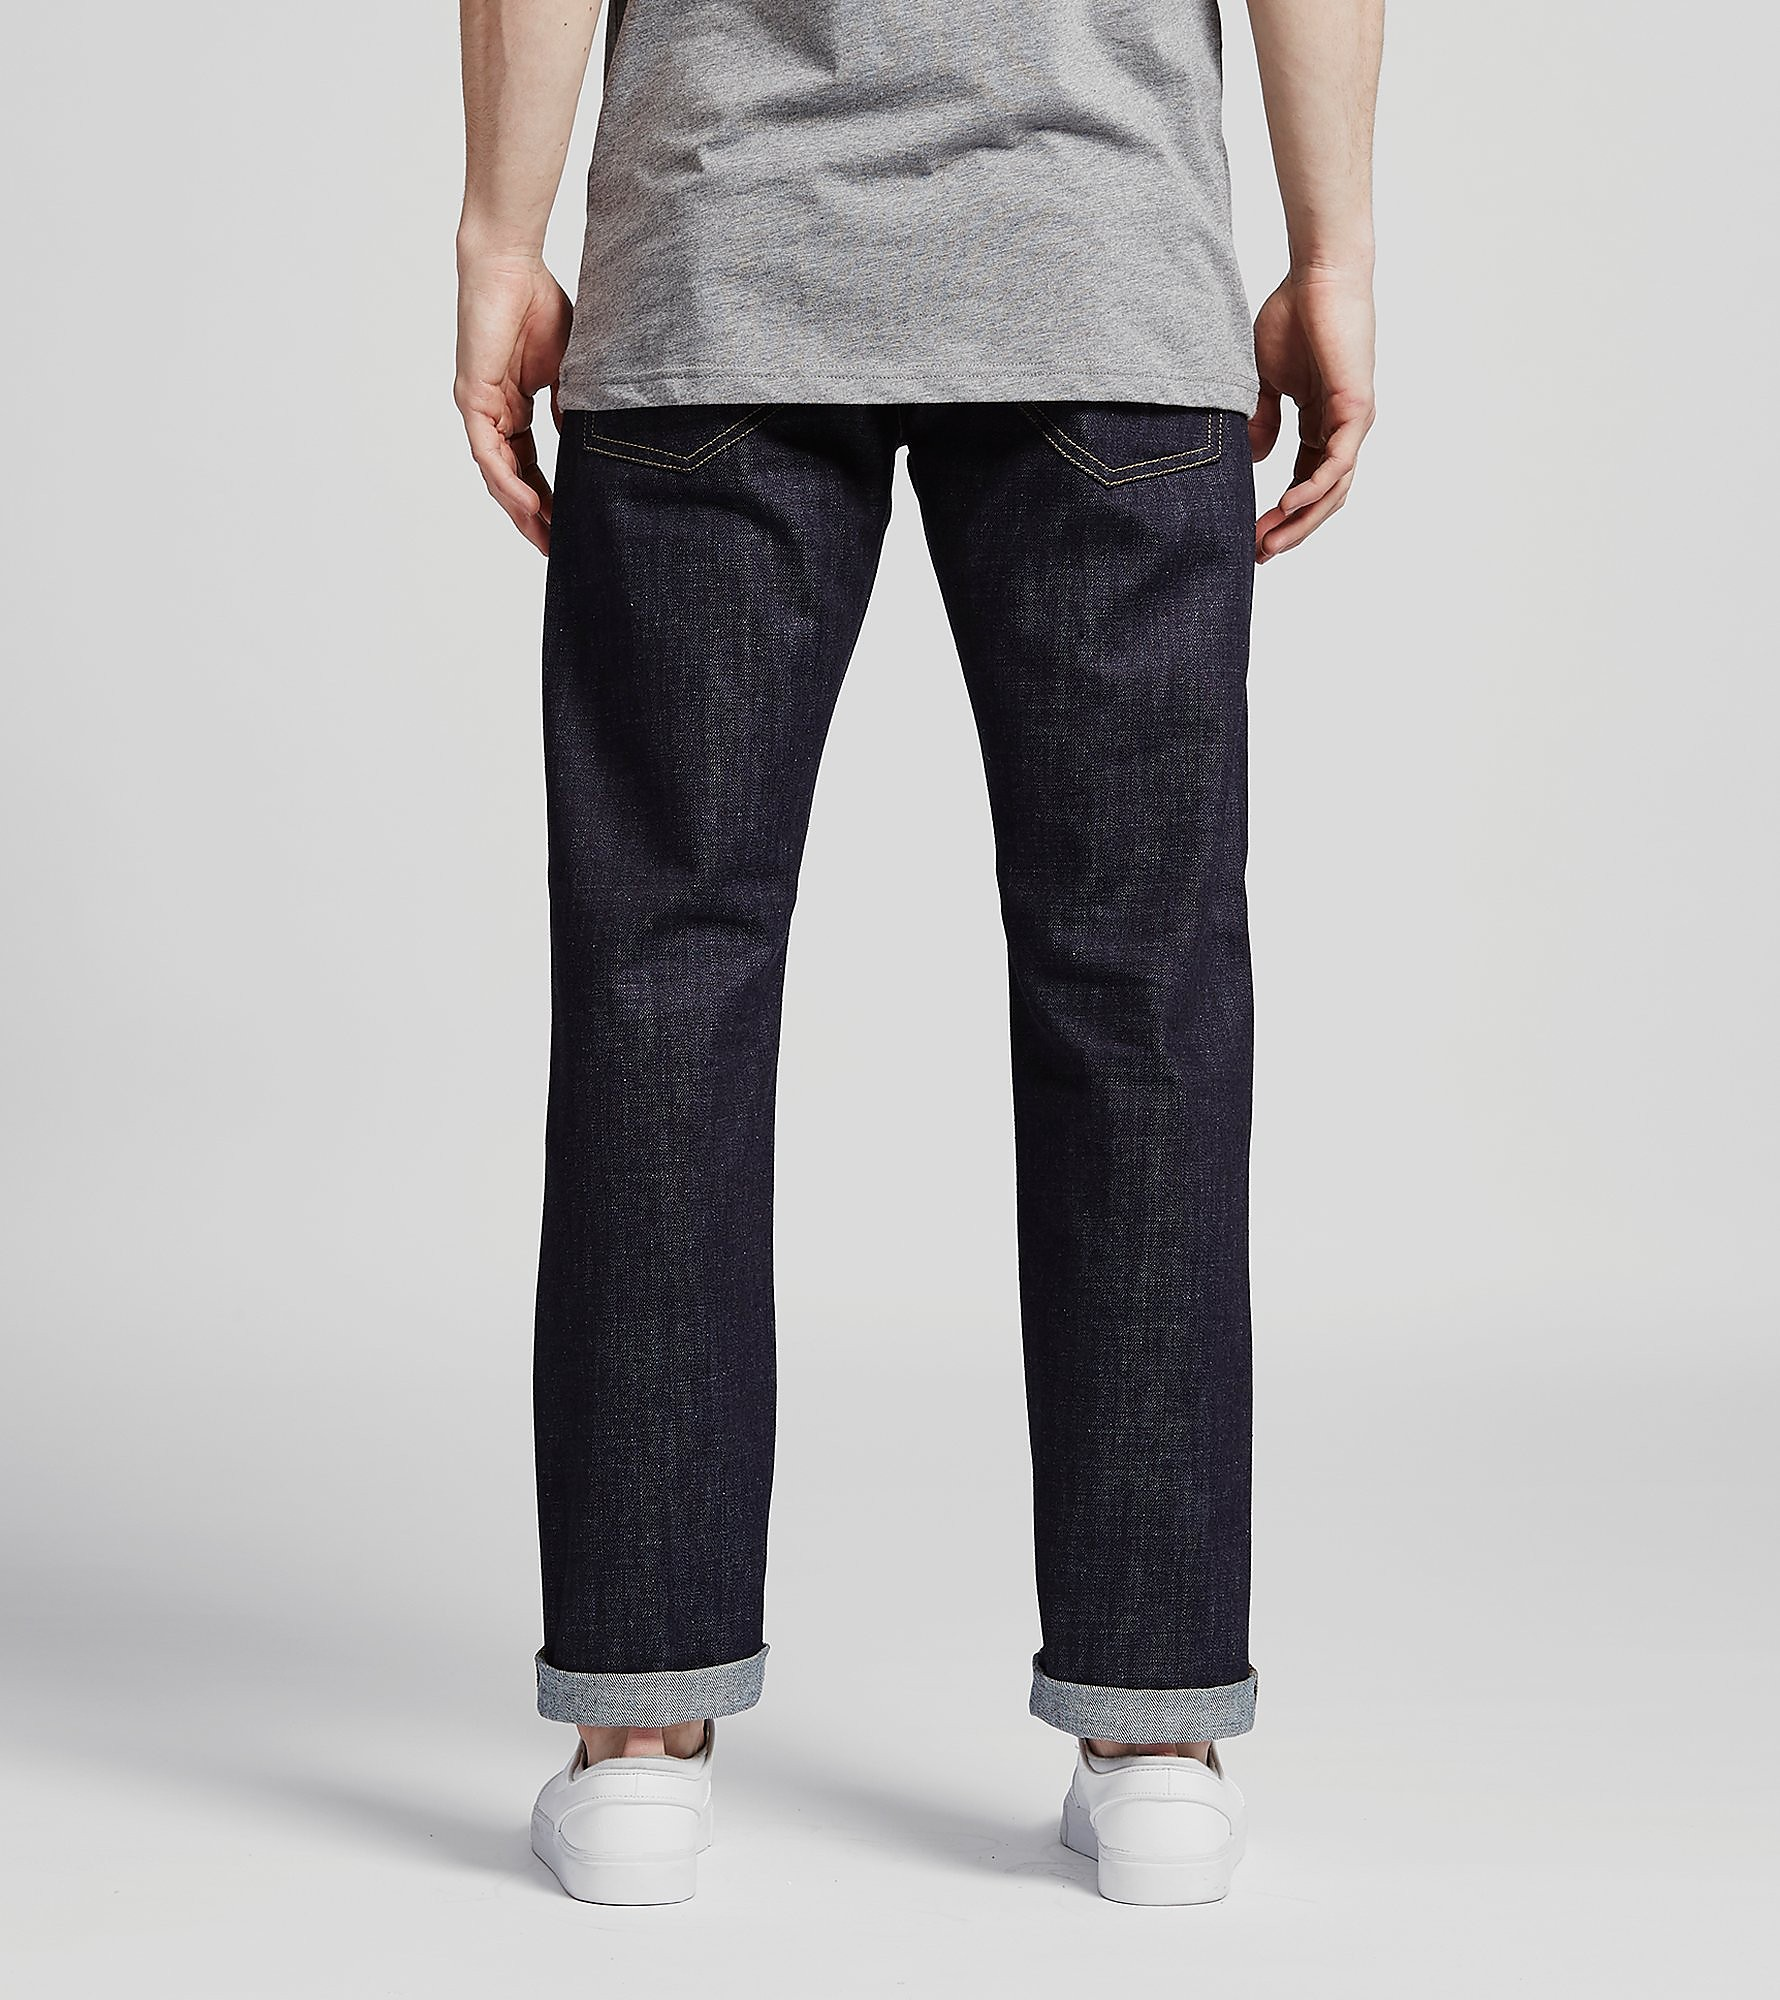 Carhartt WIP Pantalones Klondike II Blue Tapered